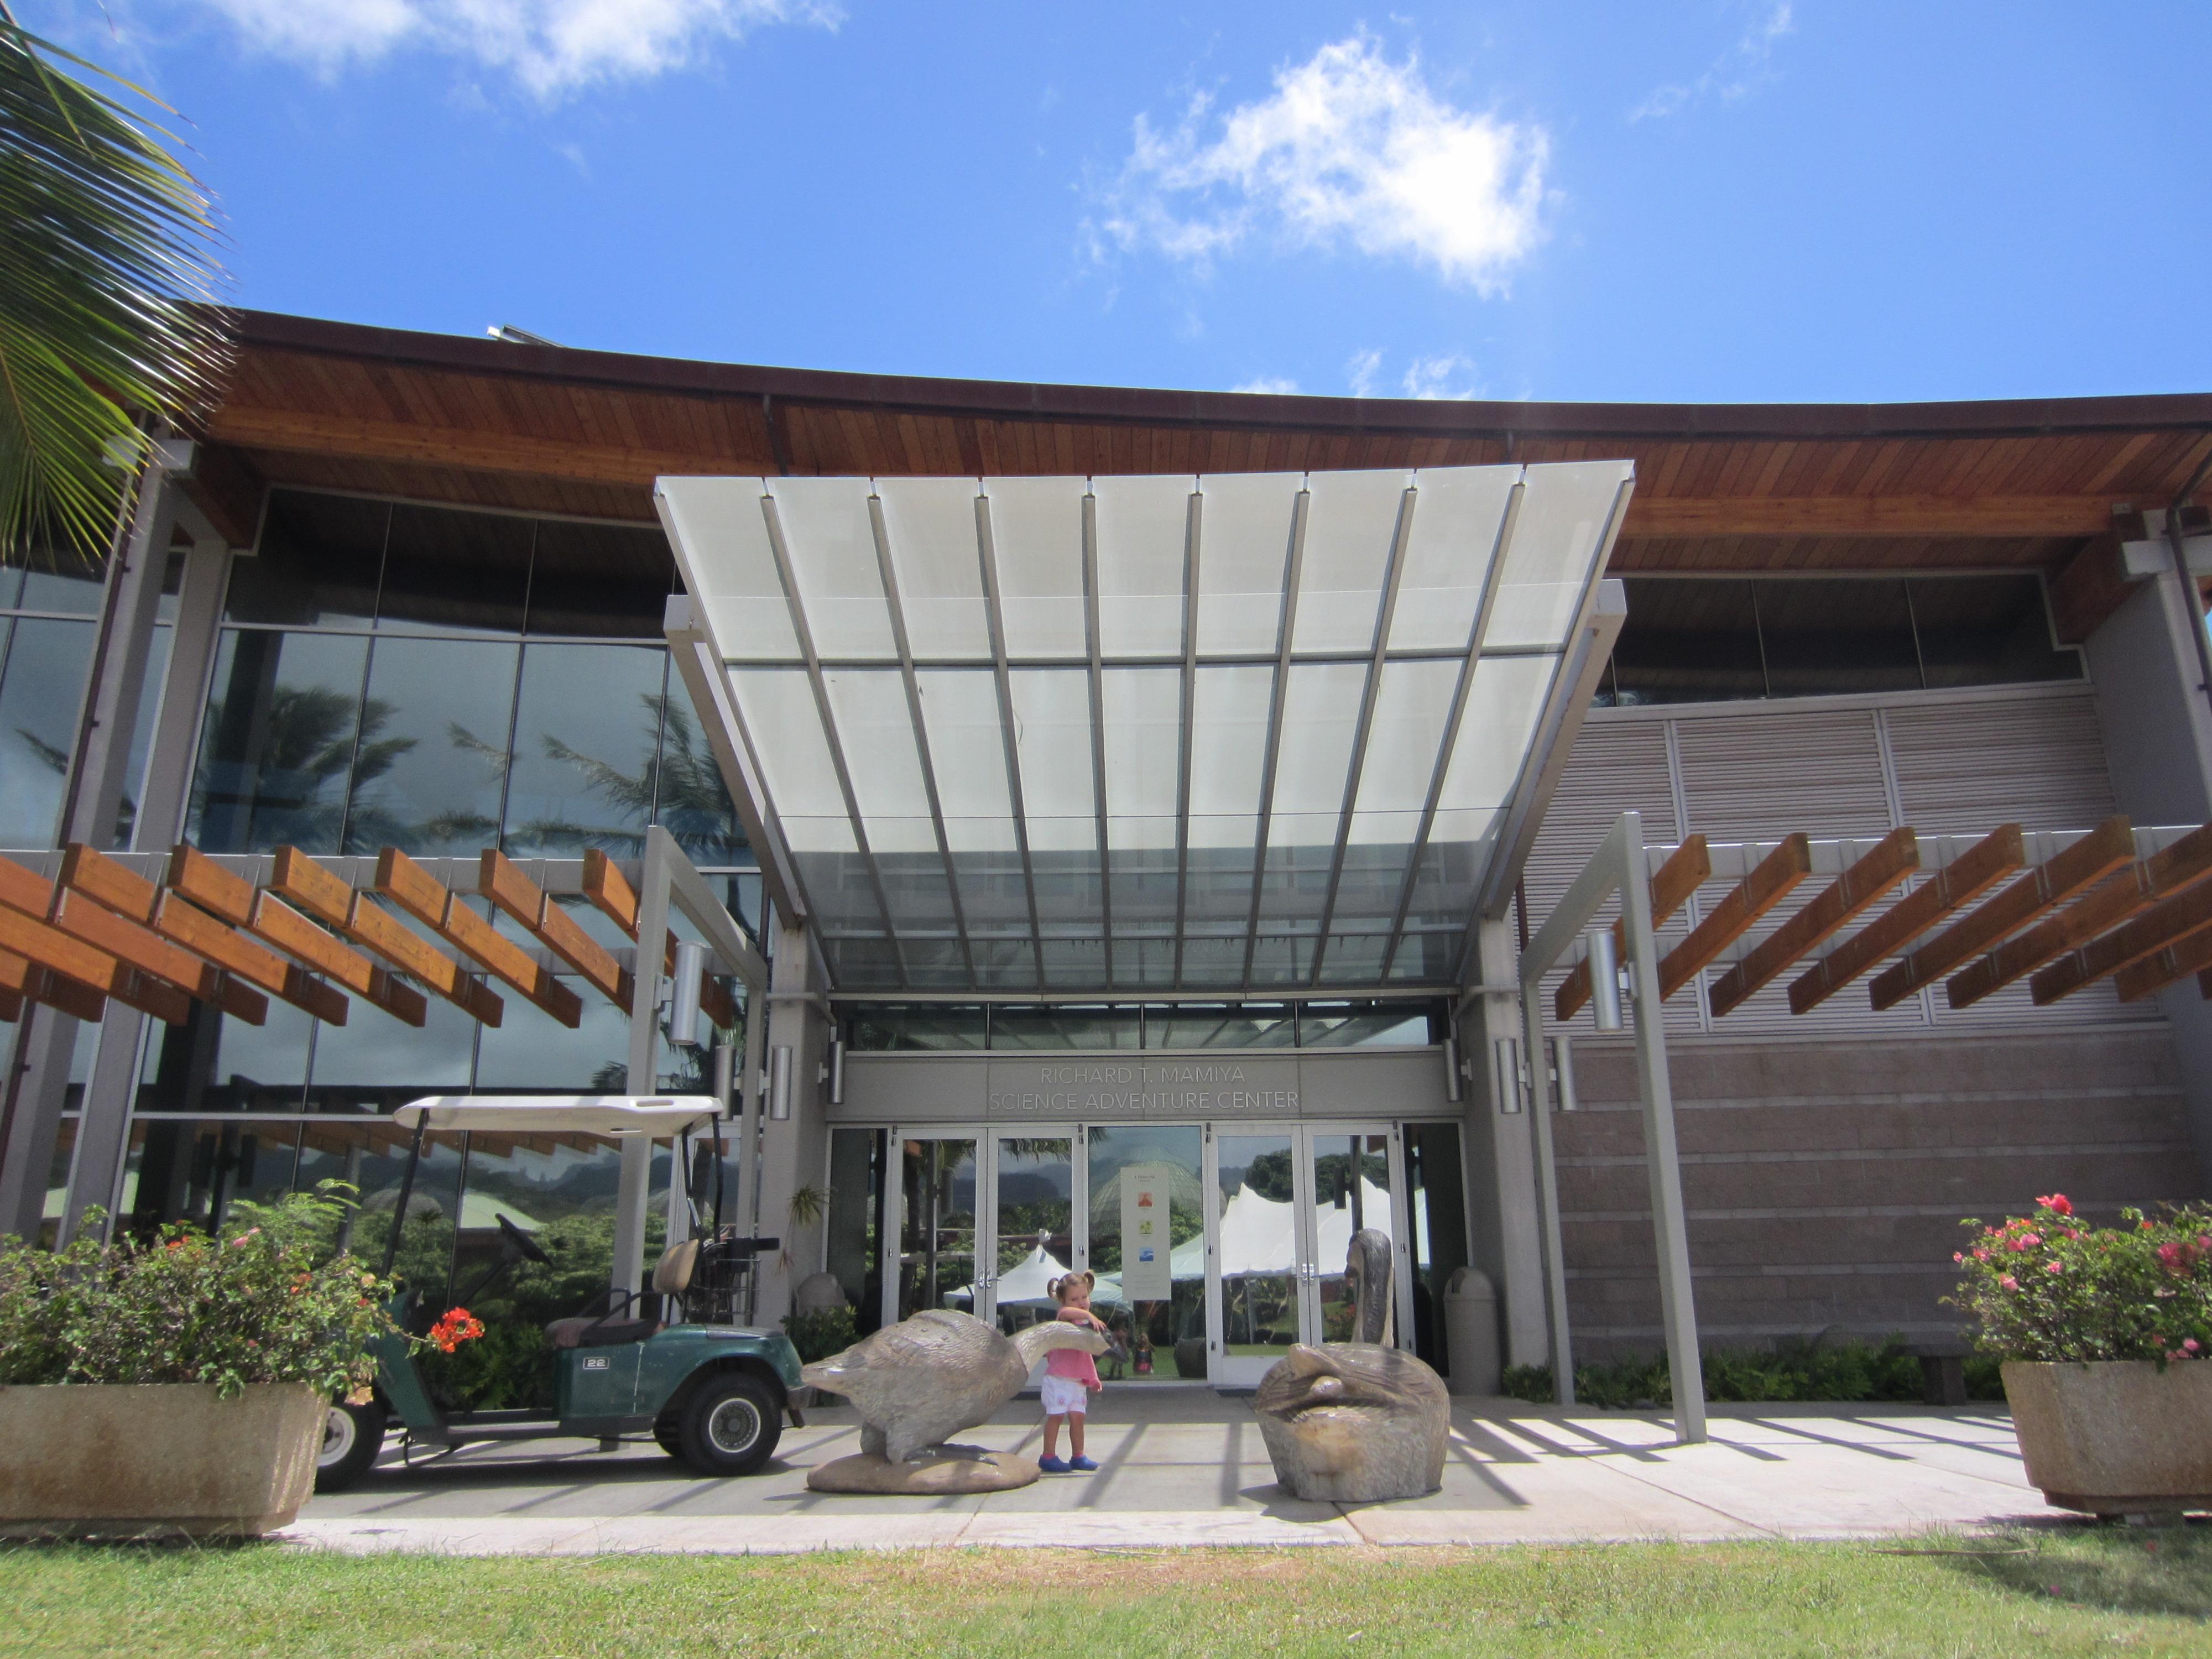 Bishop museum science adventure center